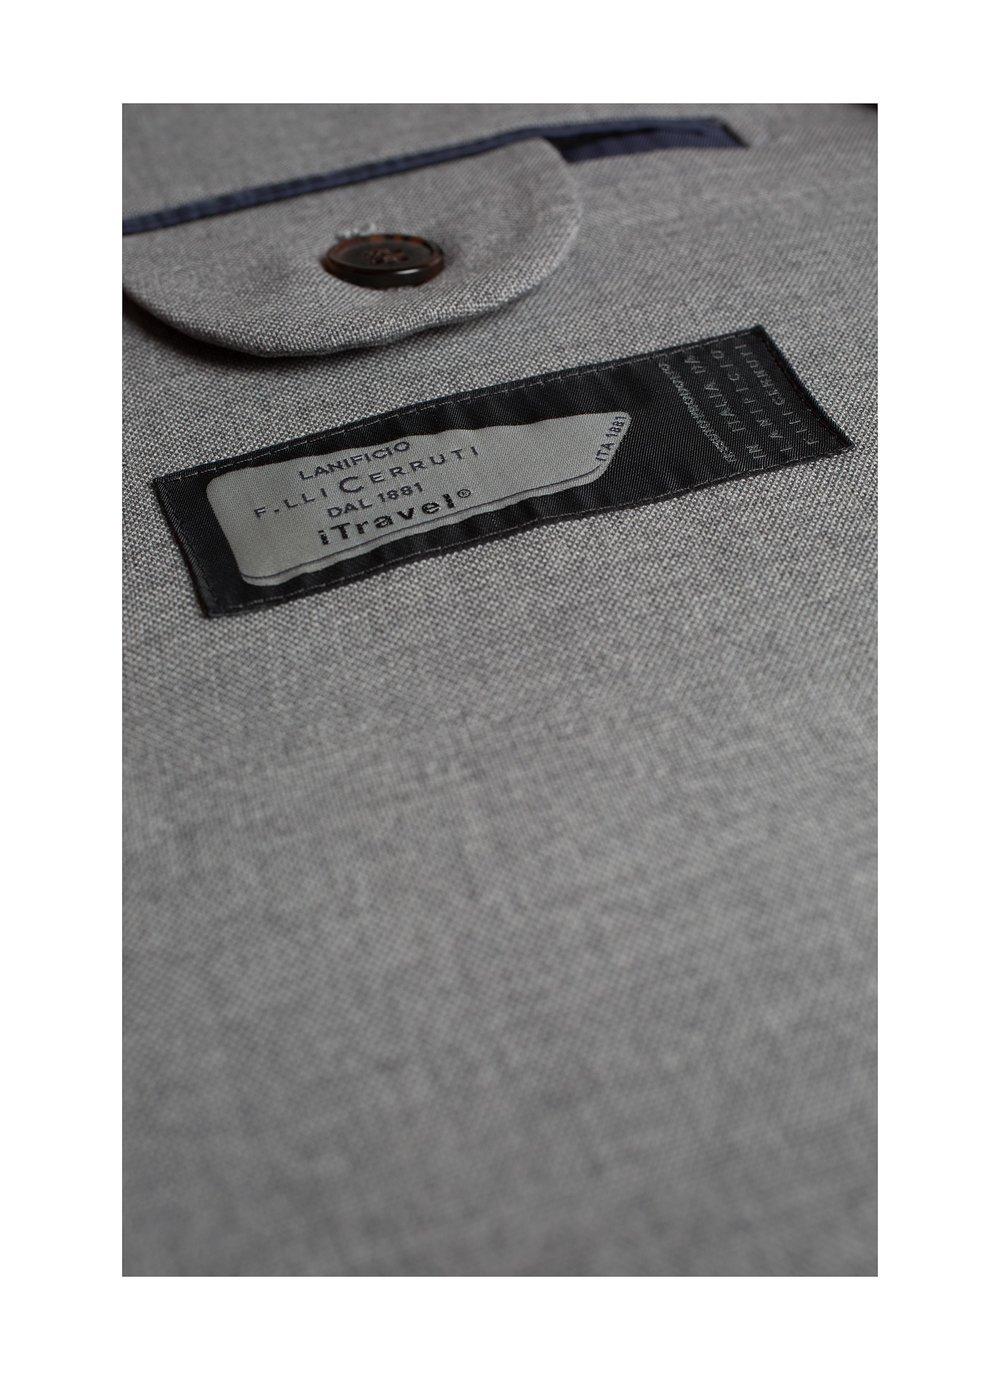 Suits_Light_Grey_Plain_Havana_Traveler_Unlined_P5184_Suitsupply_Online_Store_3.jpg